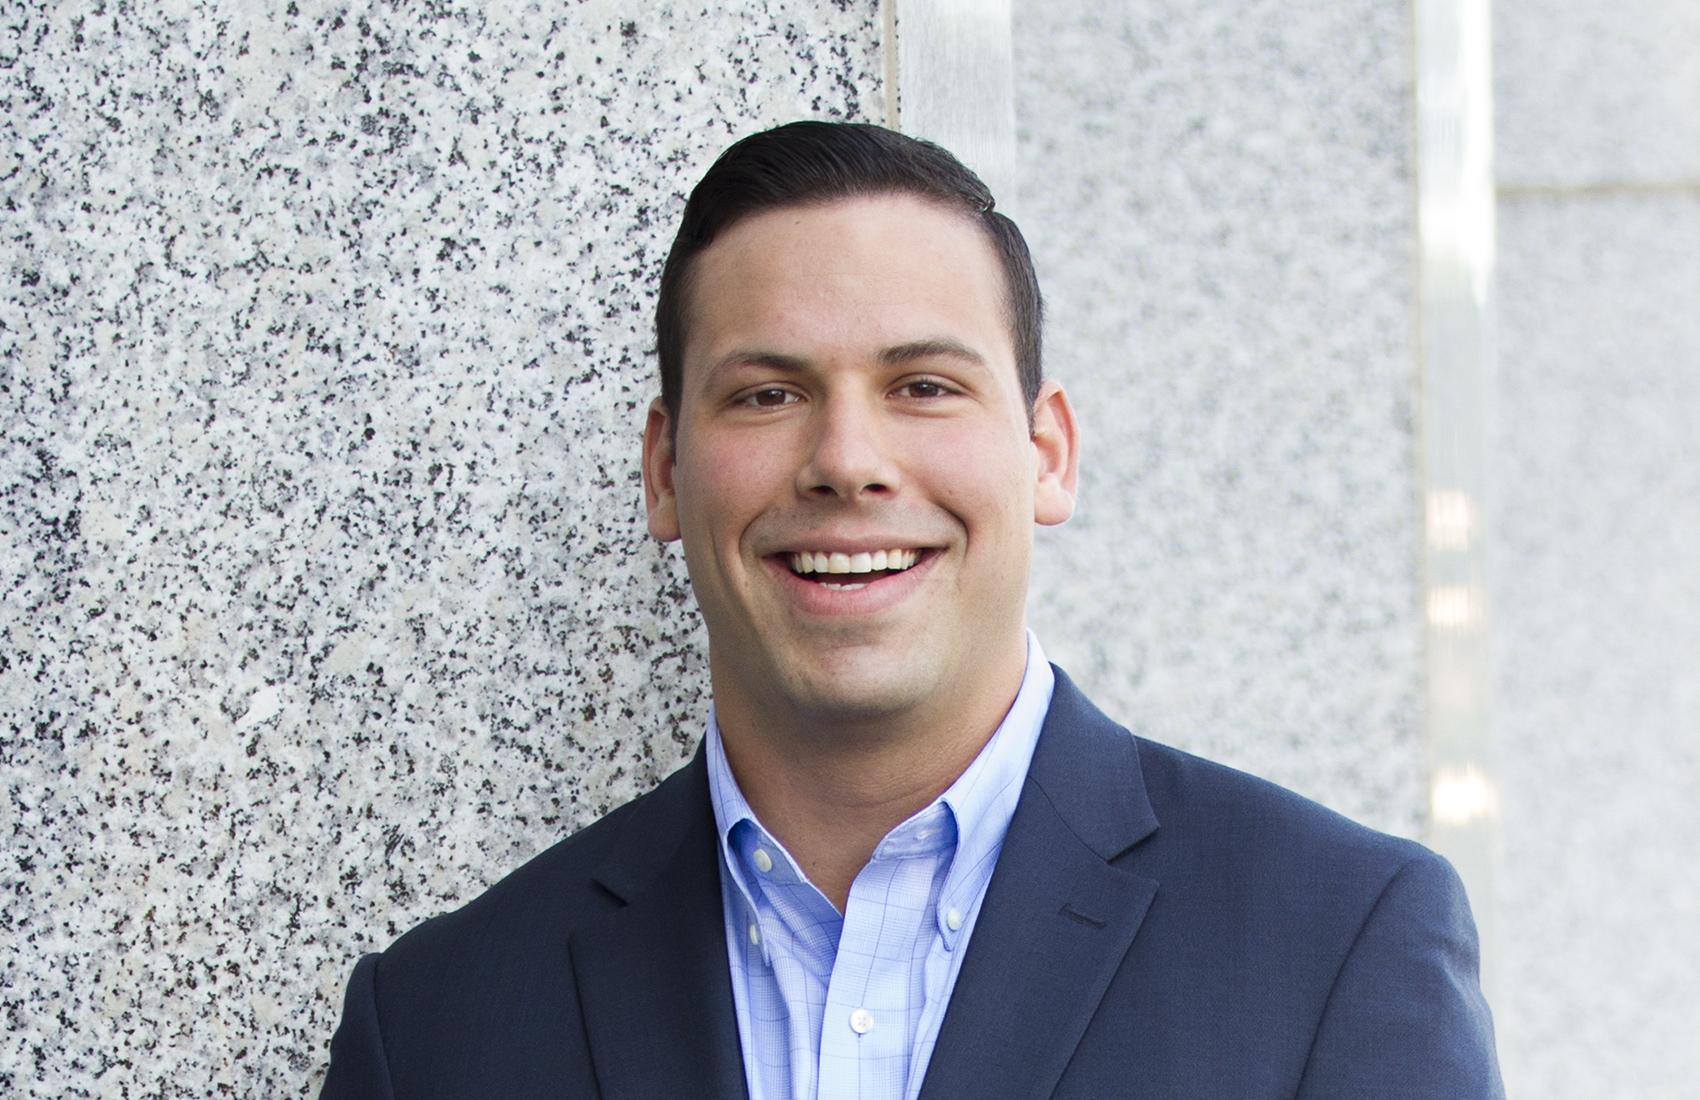 Matt Page - Analystmpage@WILsquare.com(314) 548-0920